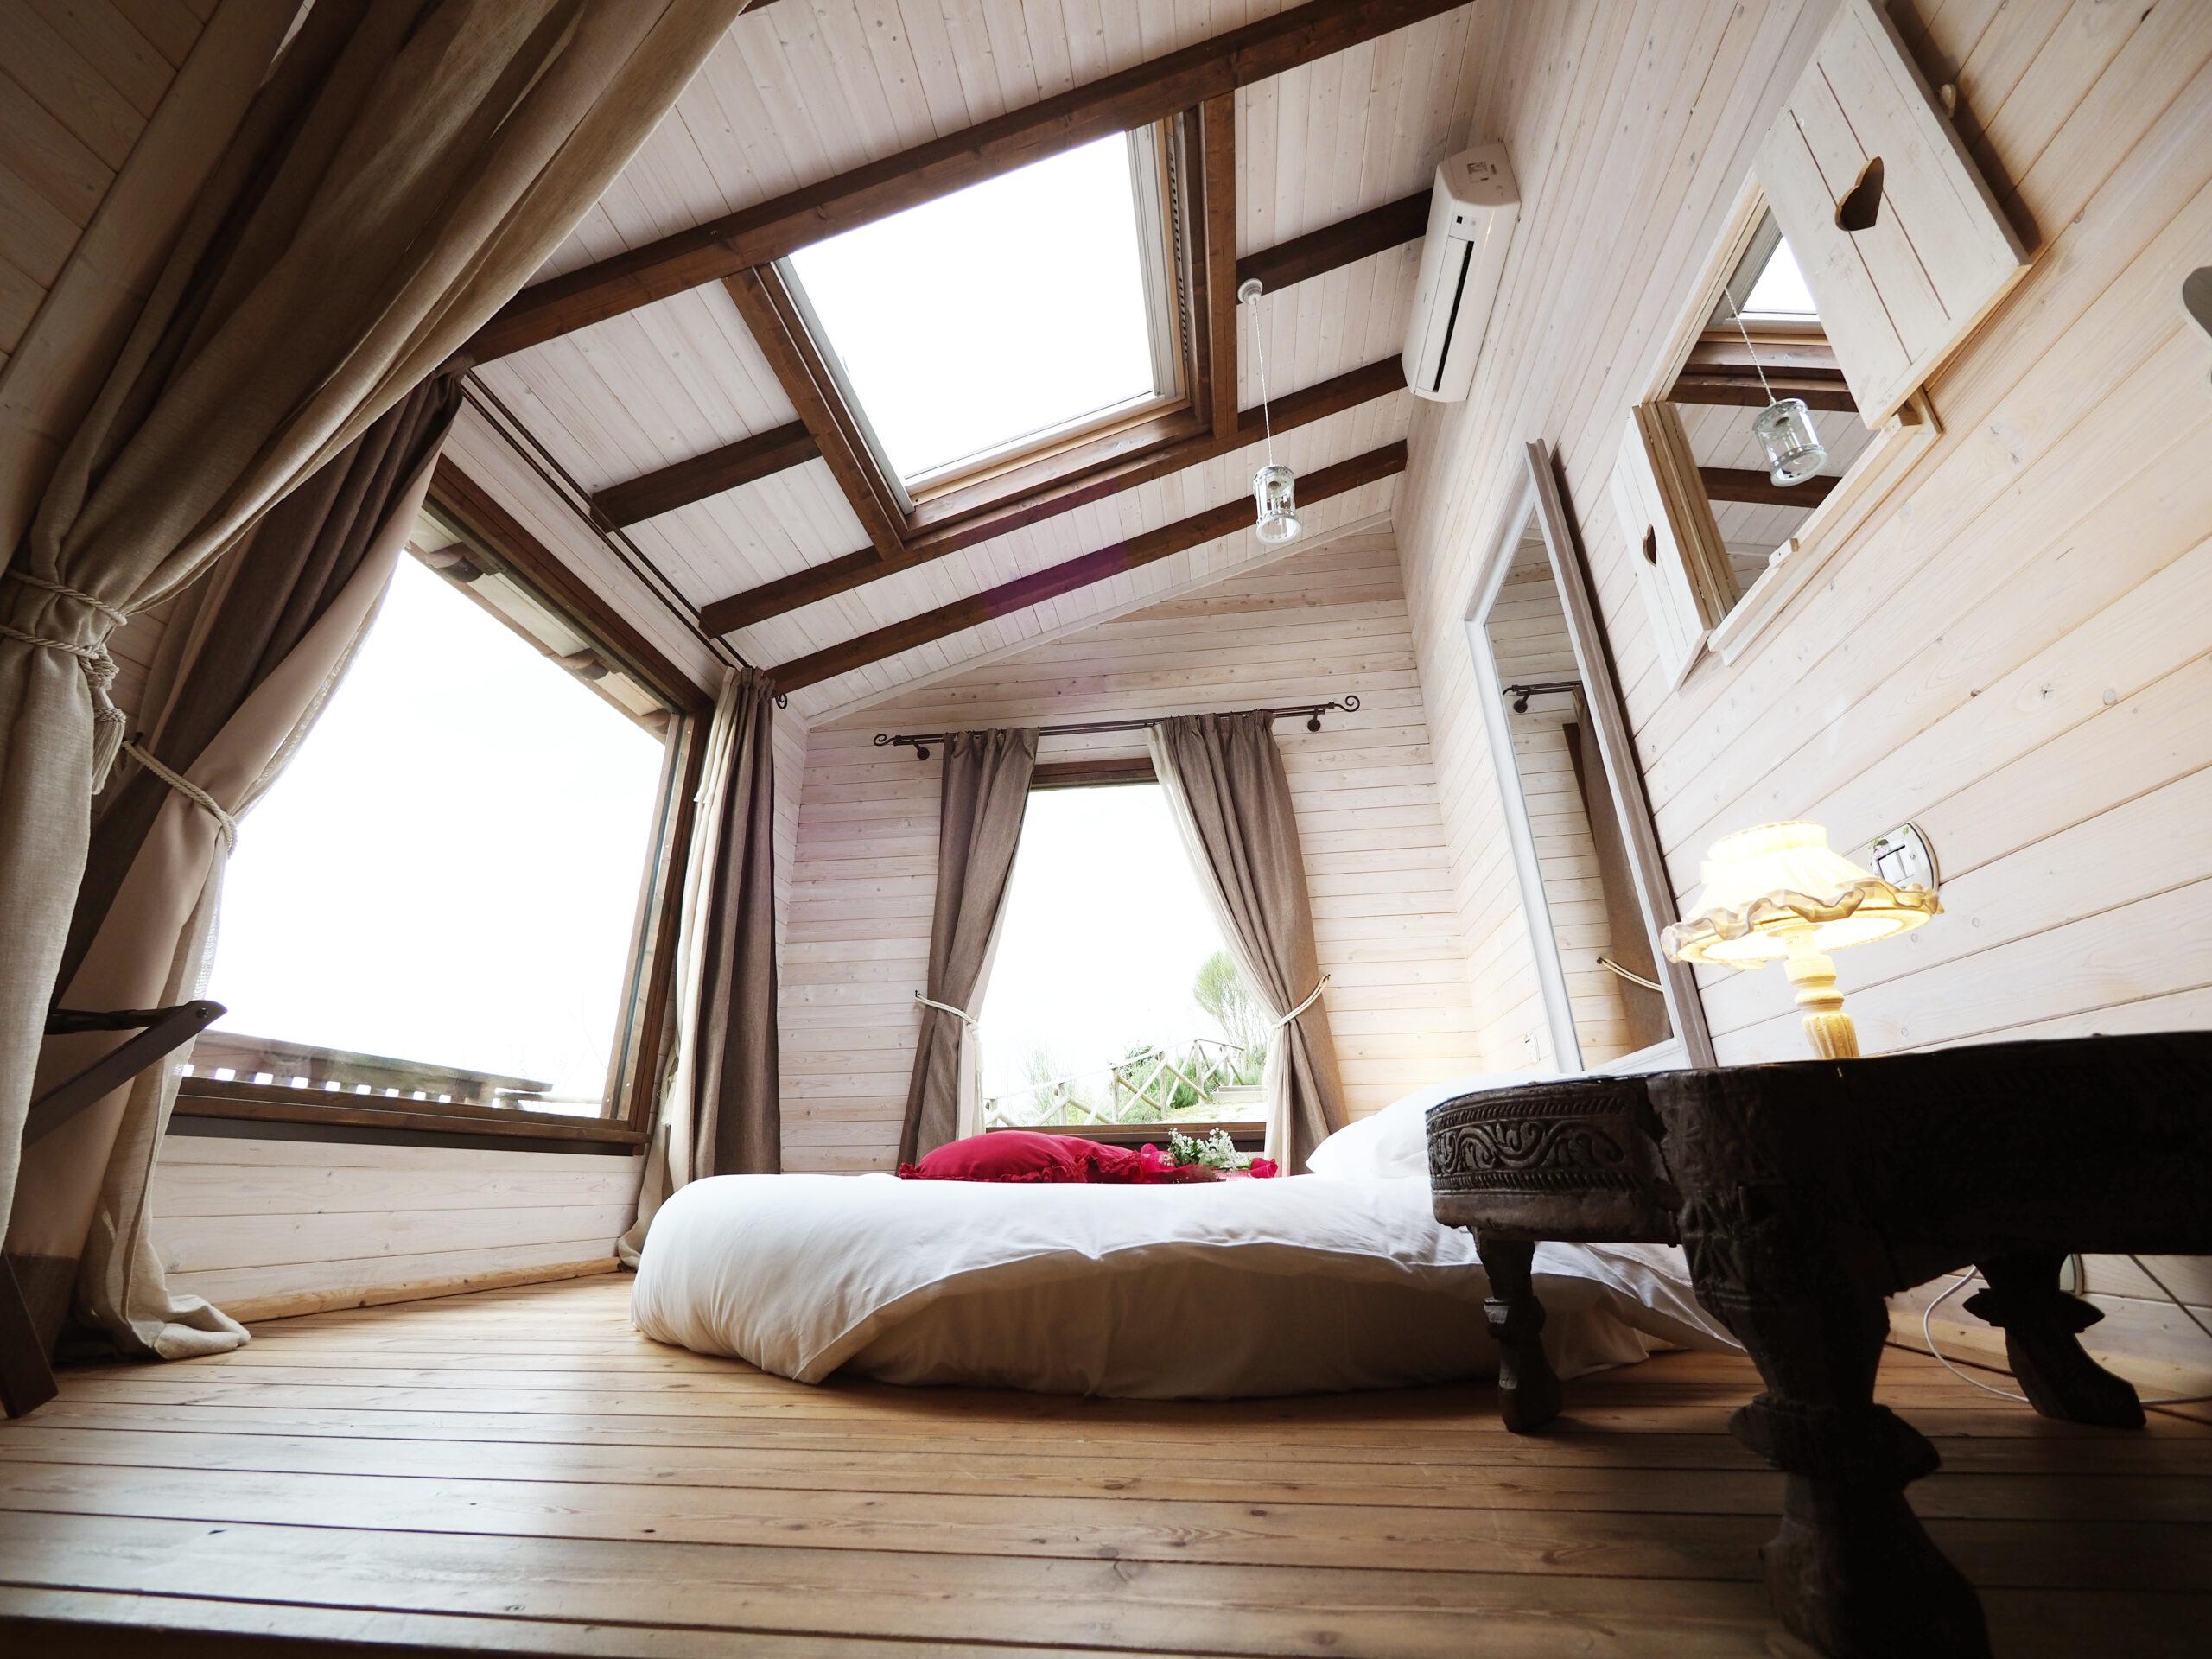 room_image_53844